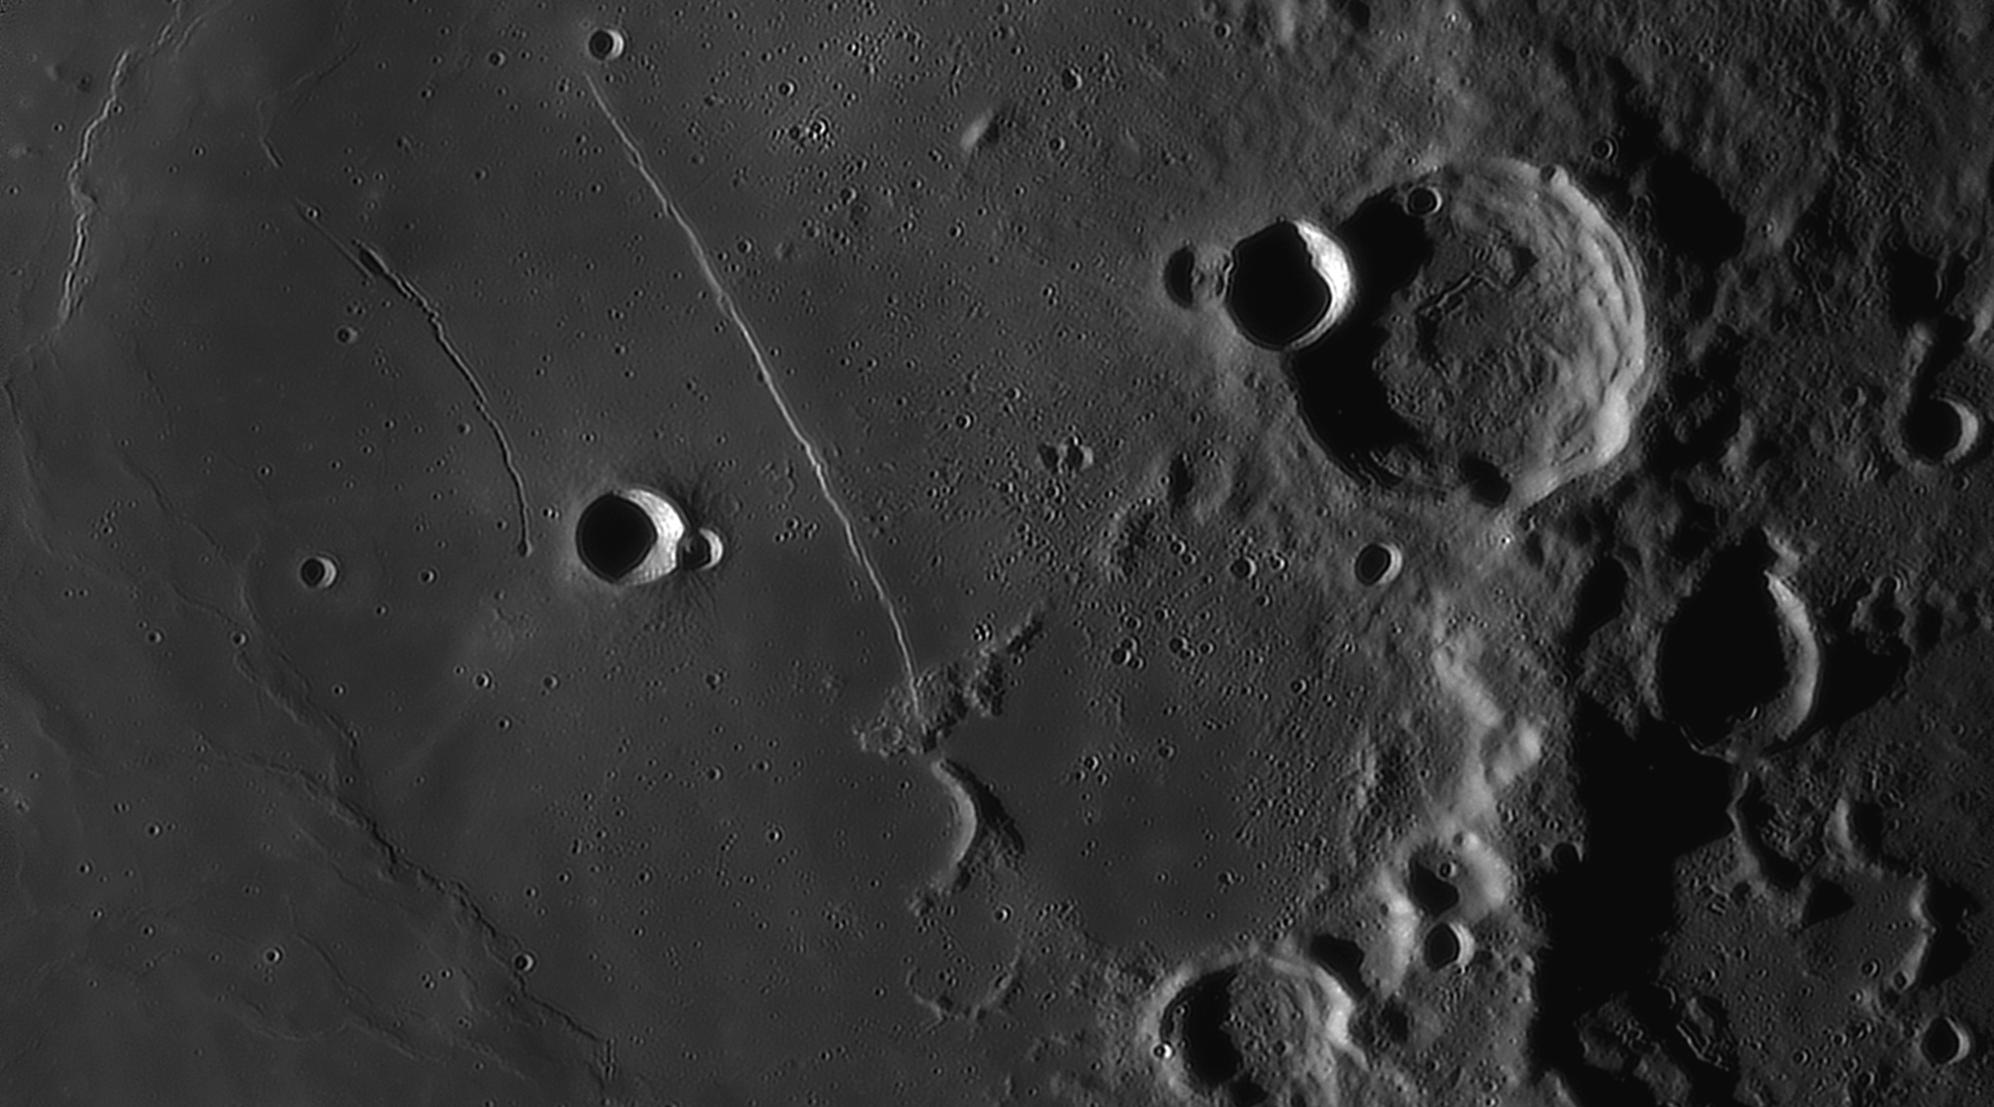 large.Moon_09_10_2020_02_27_43_R_.jpg.53cf801817f925c044751d5051b2c942.jpg